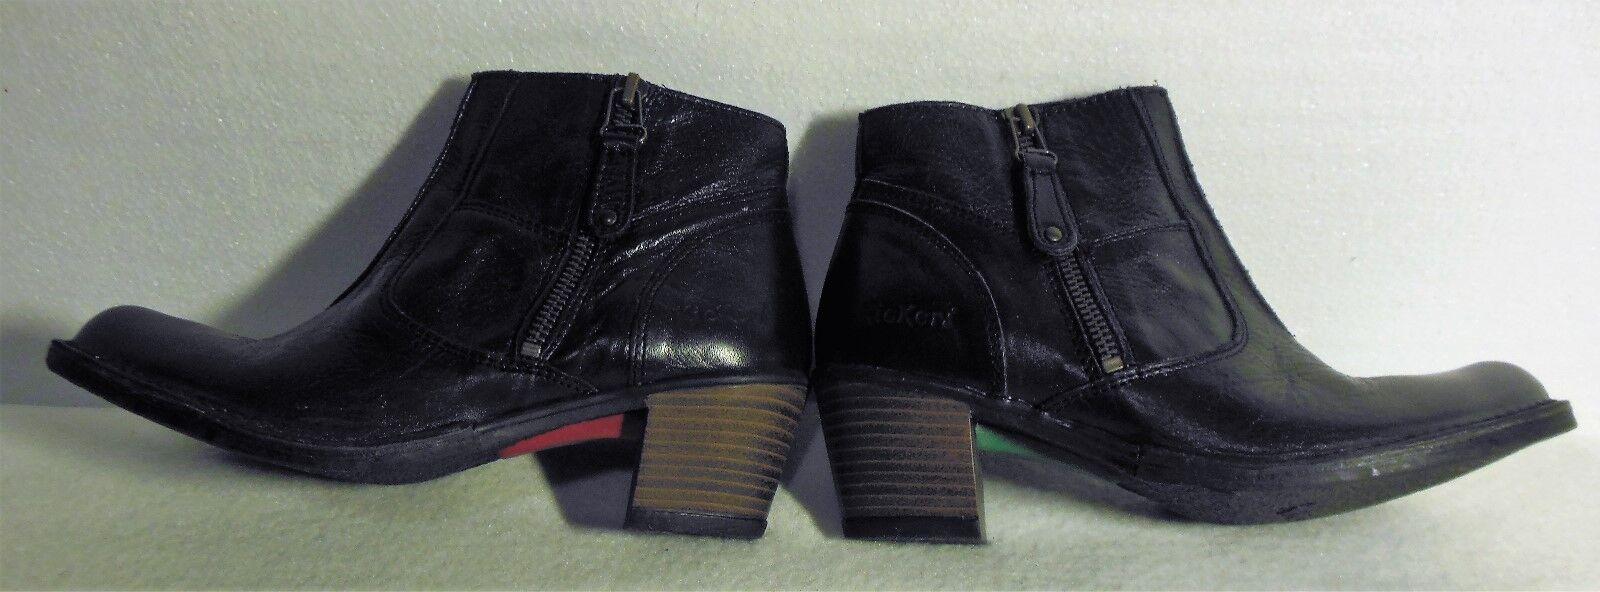 NIB NIB NIB Women's Black Kickers Nantucket Ankle Boot Size 6 M  (37)  MSRP  158 967051